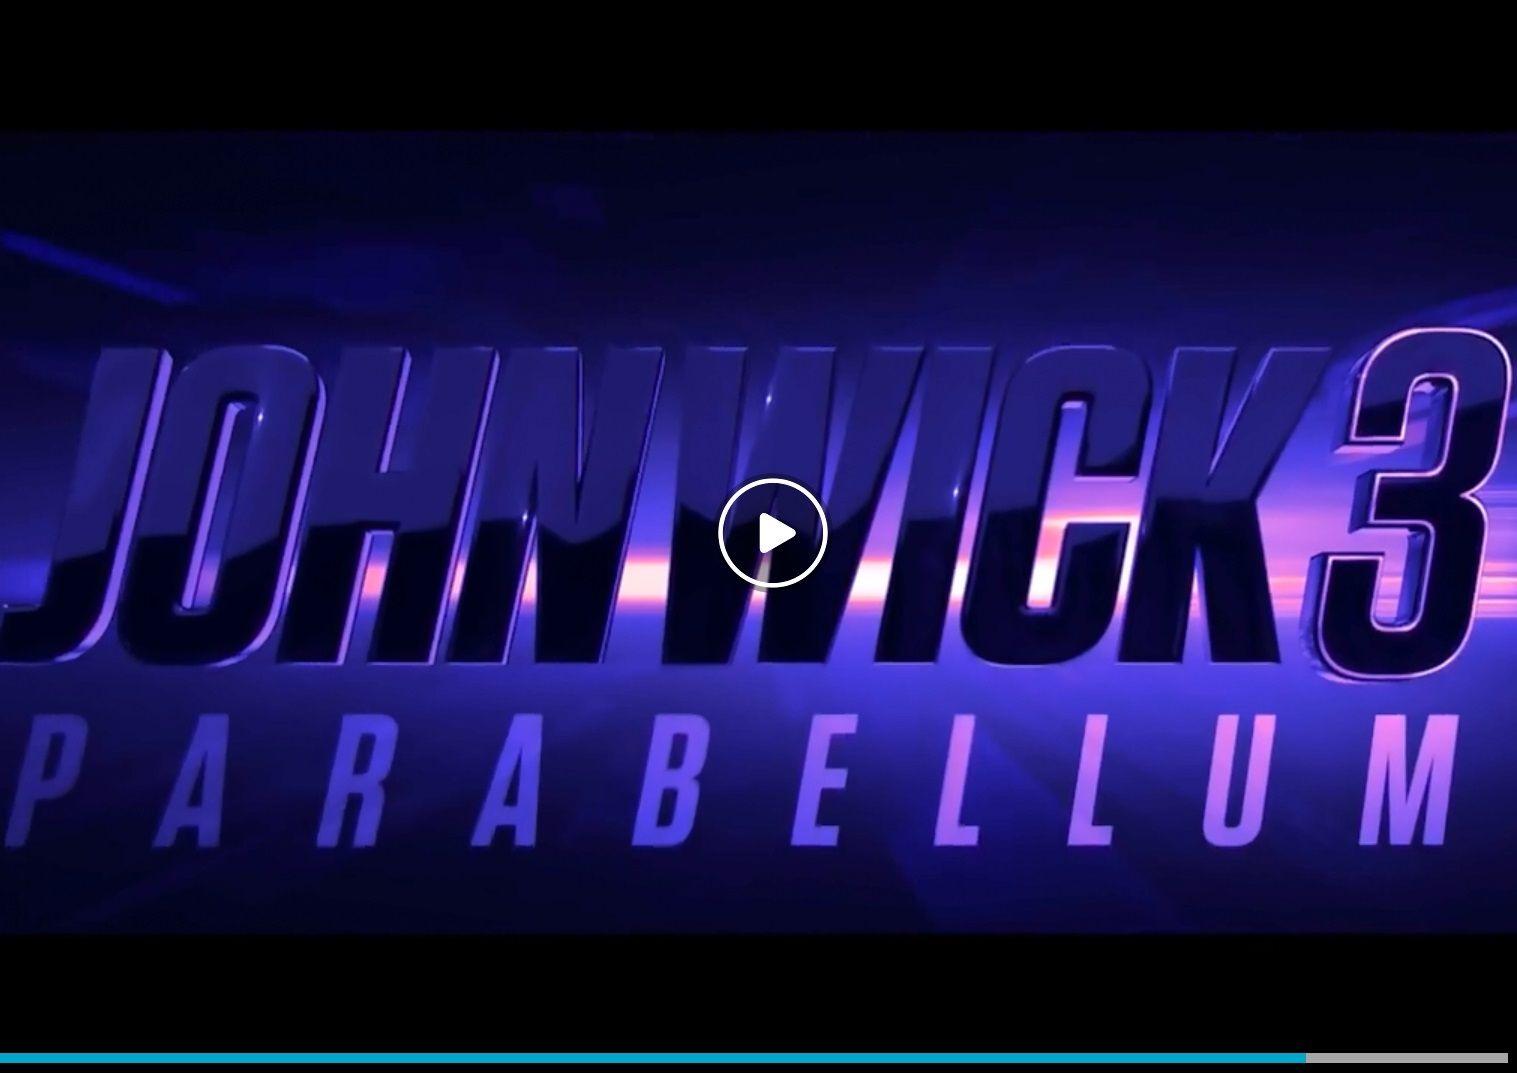 John Wick 3 Stream Openload